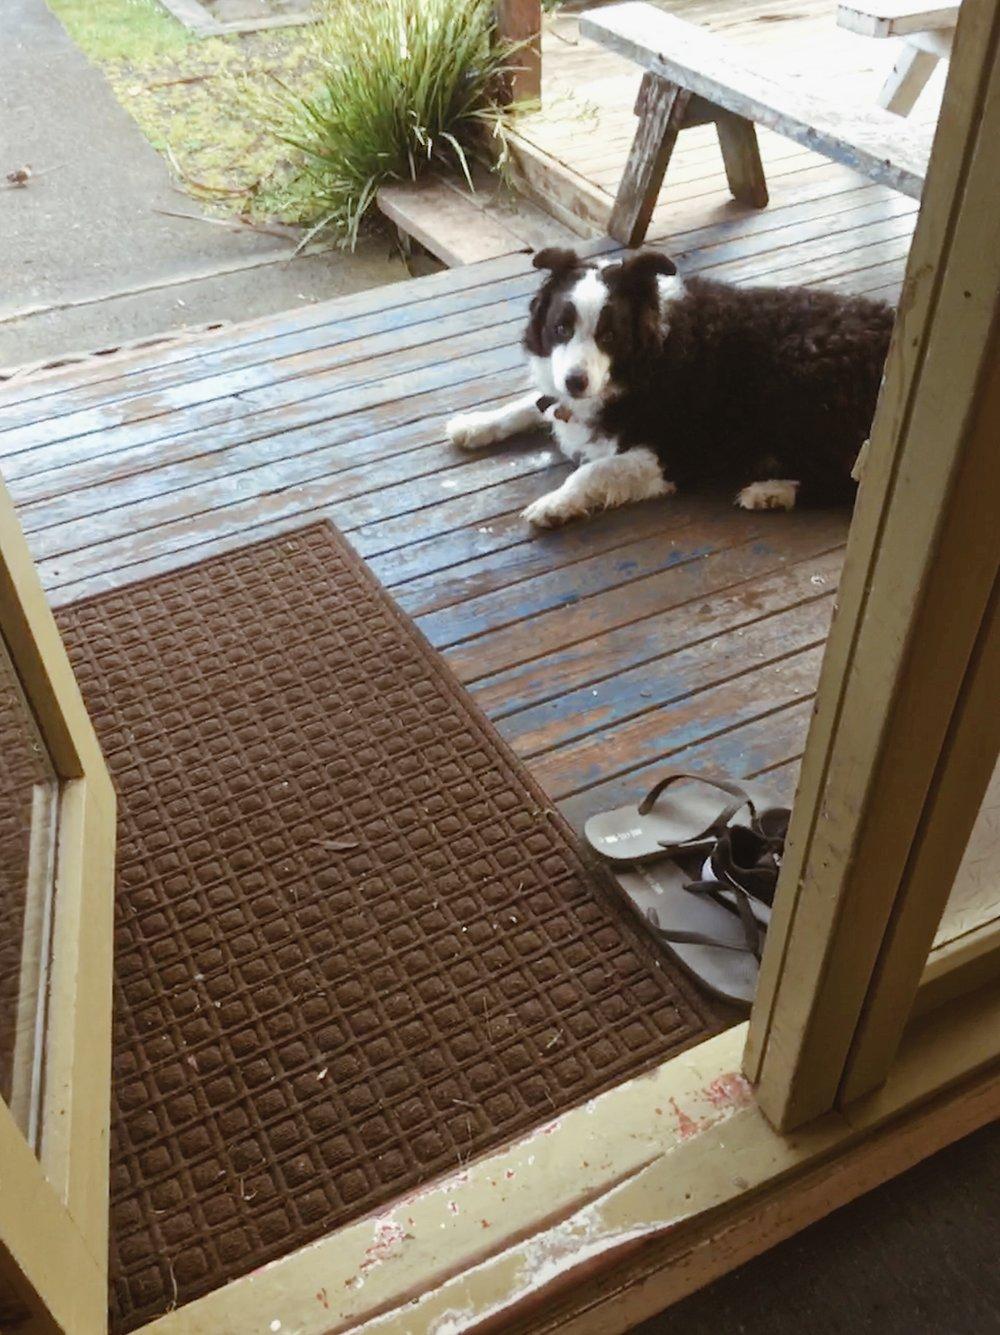 Good news, I met a dog in Raglan.